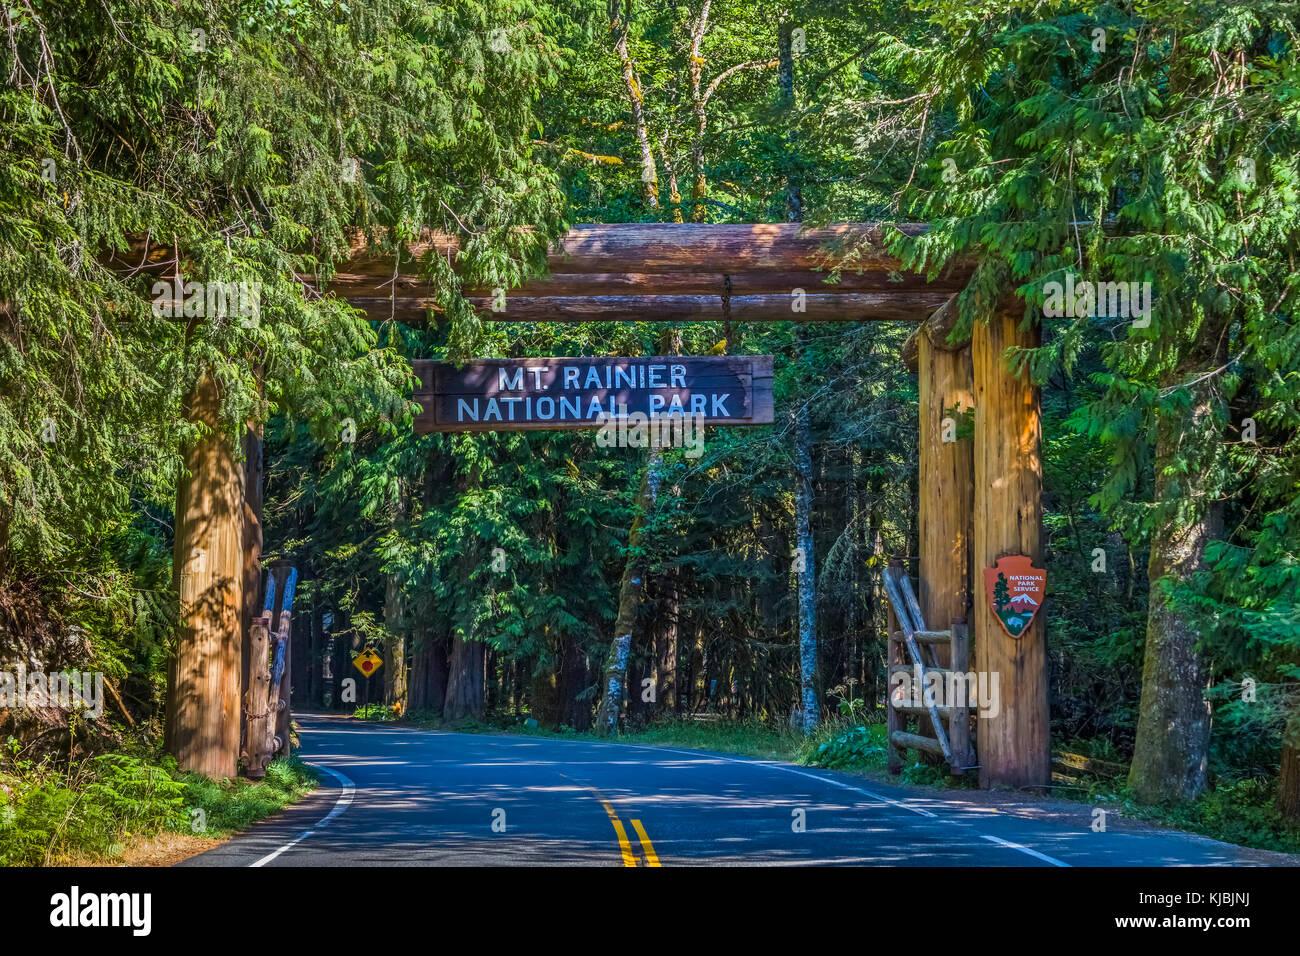 Nisqually Entrance at Ashford Washington to Mount Rainier National Park in Washington State in the United States - Stock Image